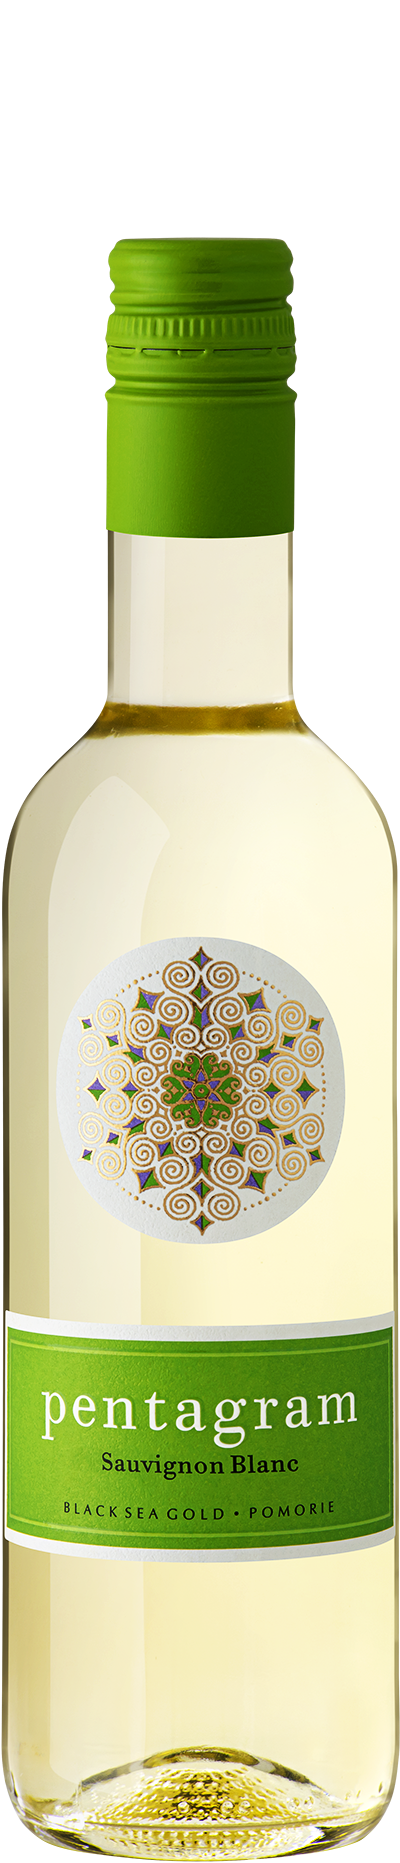 Бяло Вино Пентаграм Совиньон Блан Поморие 0.375 л